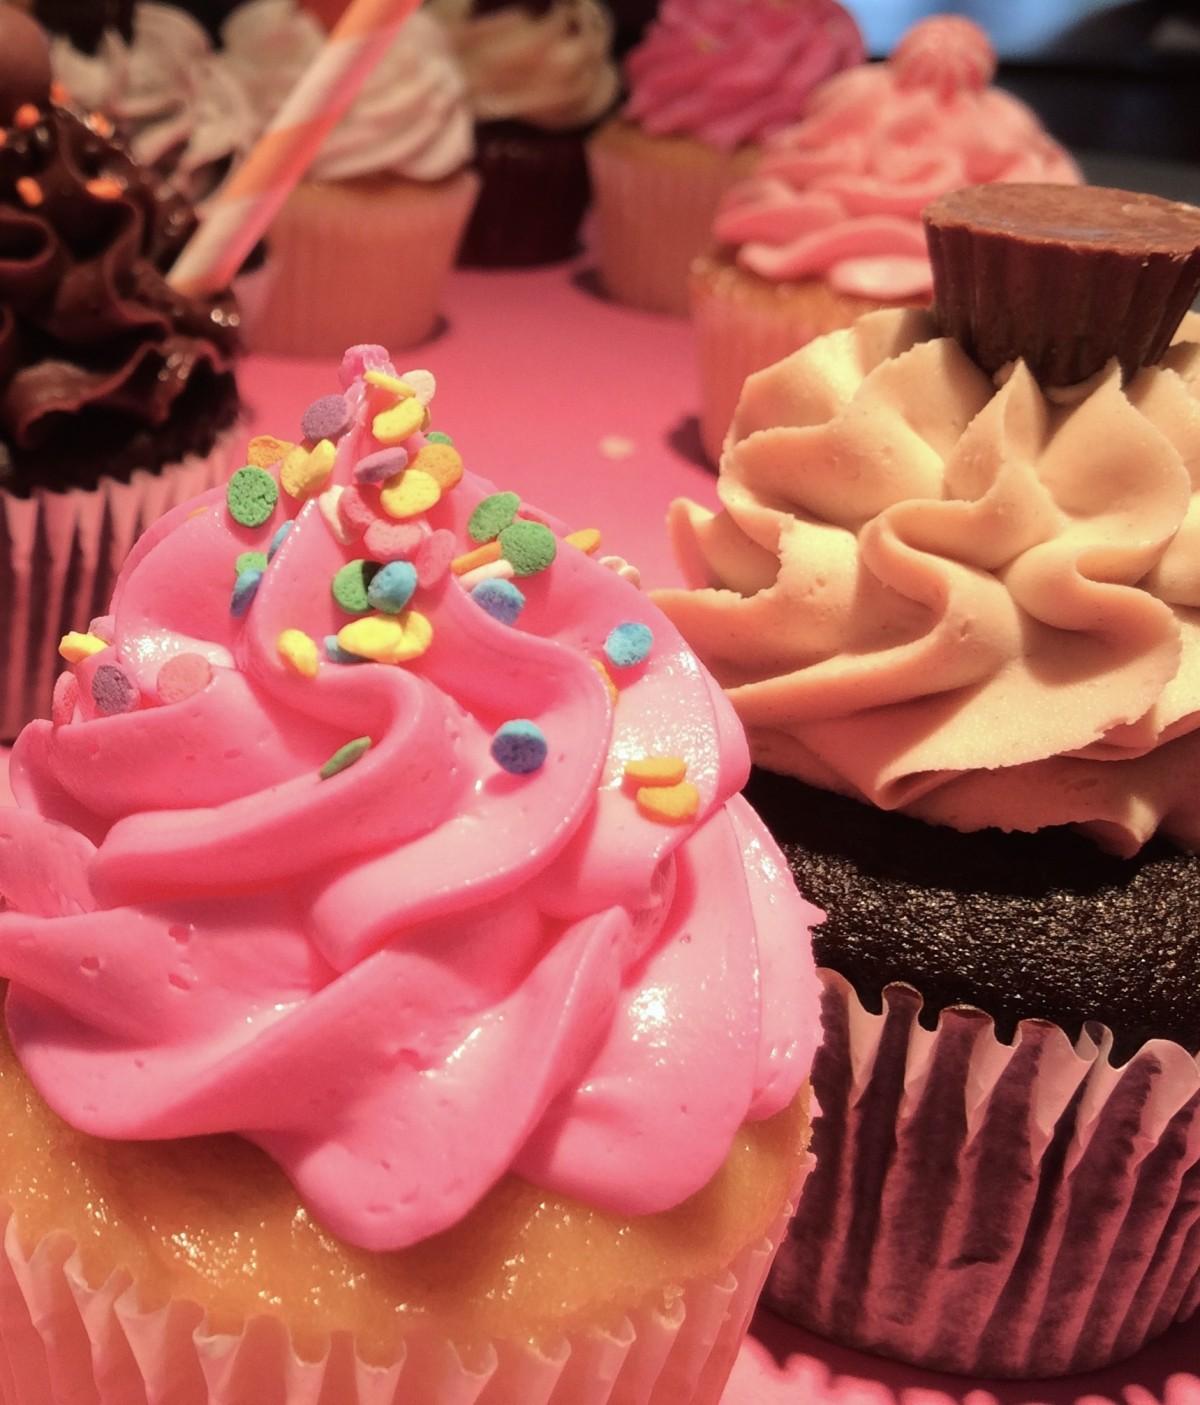 Free images flower food plate blue cupcake baking frosting dessert icing fondant - Creme decoration cupcake ...